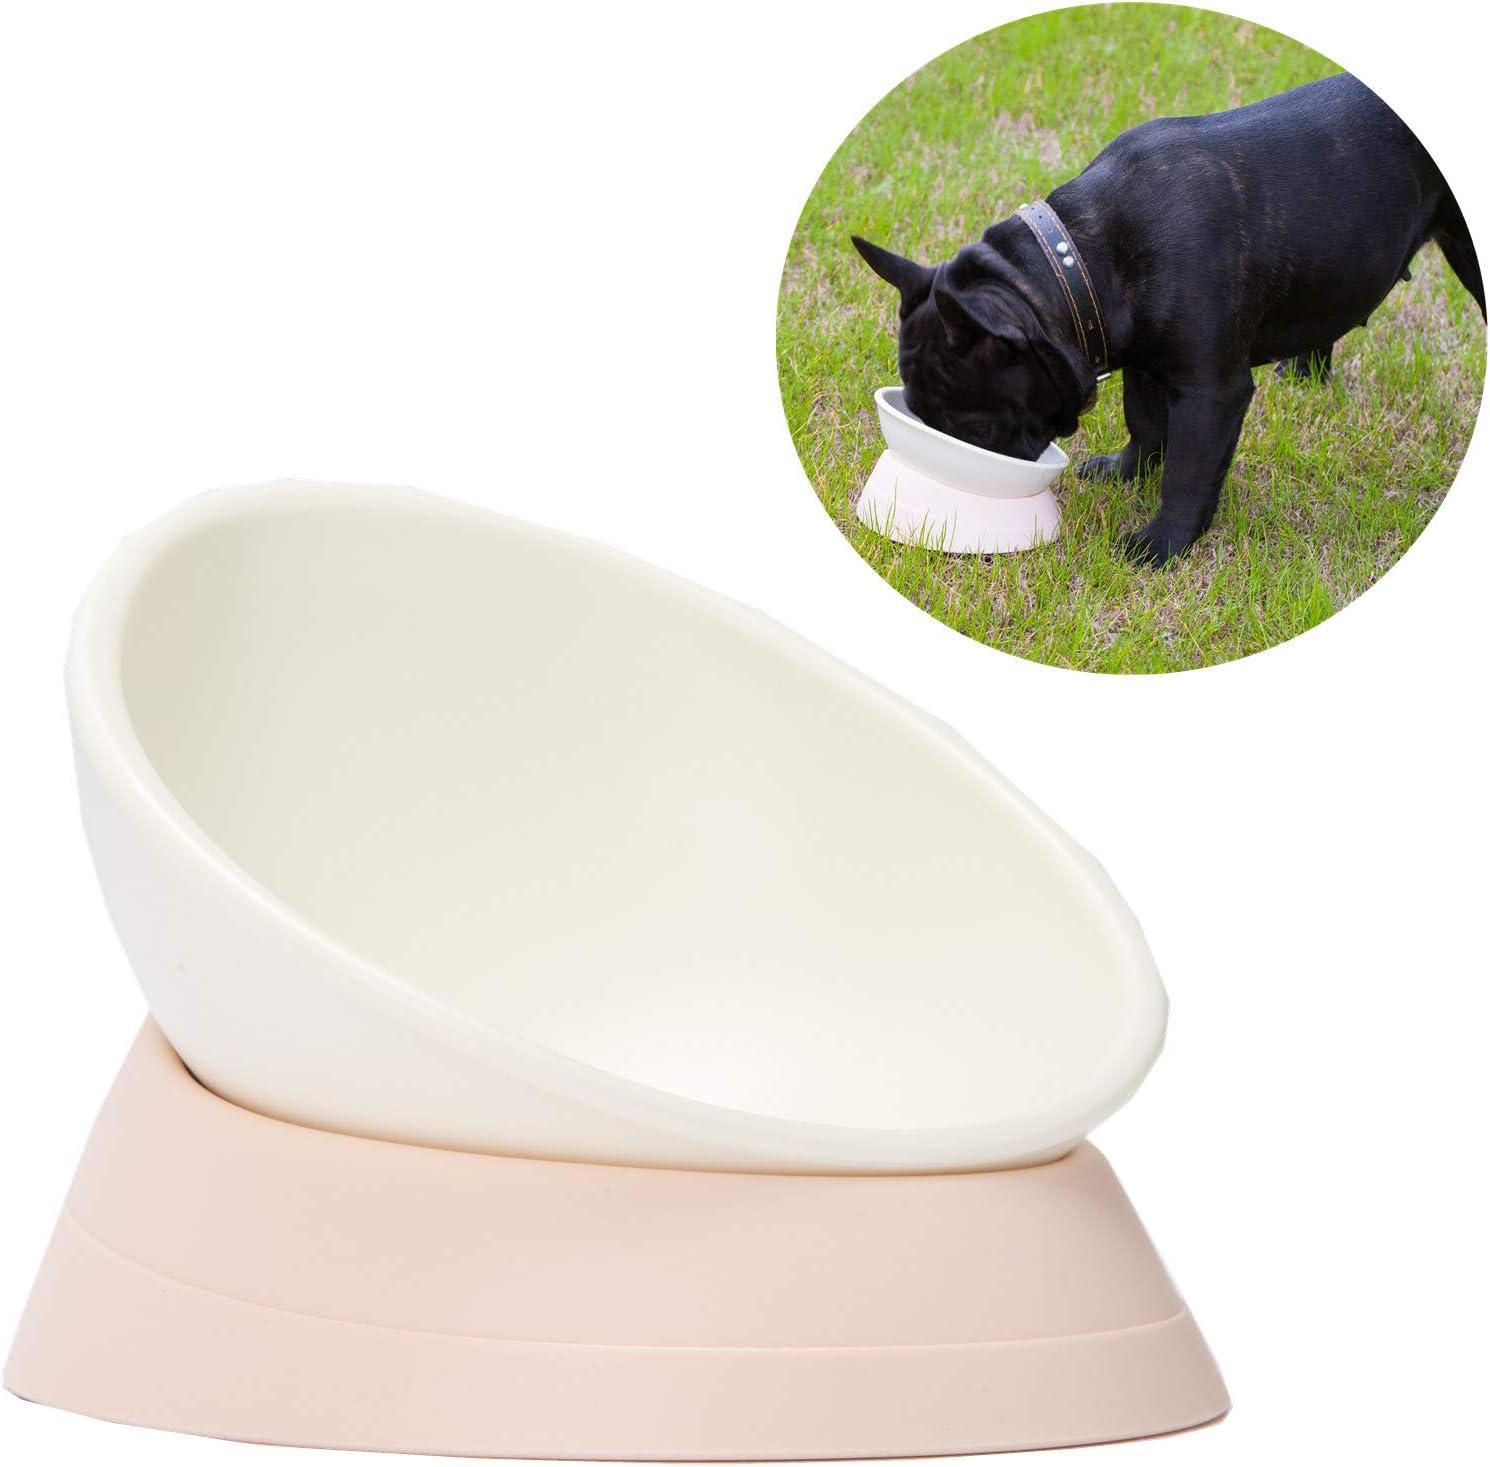 JWPC Bulldog - Cuenco Antideslizante para Perro o Gato, de Goma, extraíble, estéril, Inclinado, Base Inclinada para comedero de Mascotas